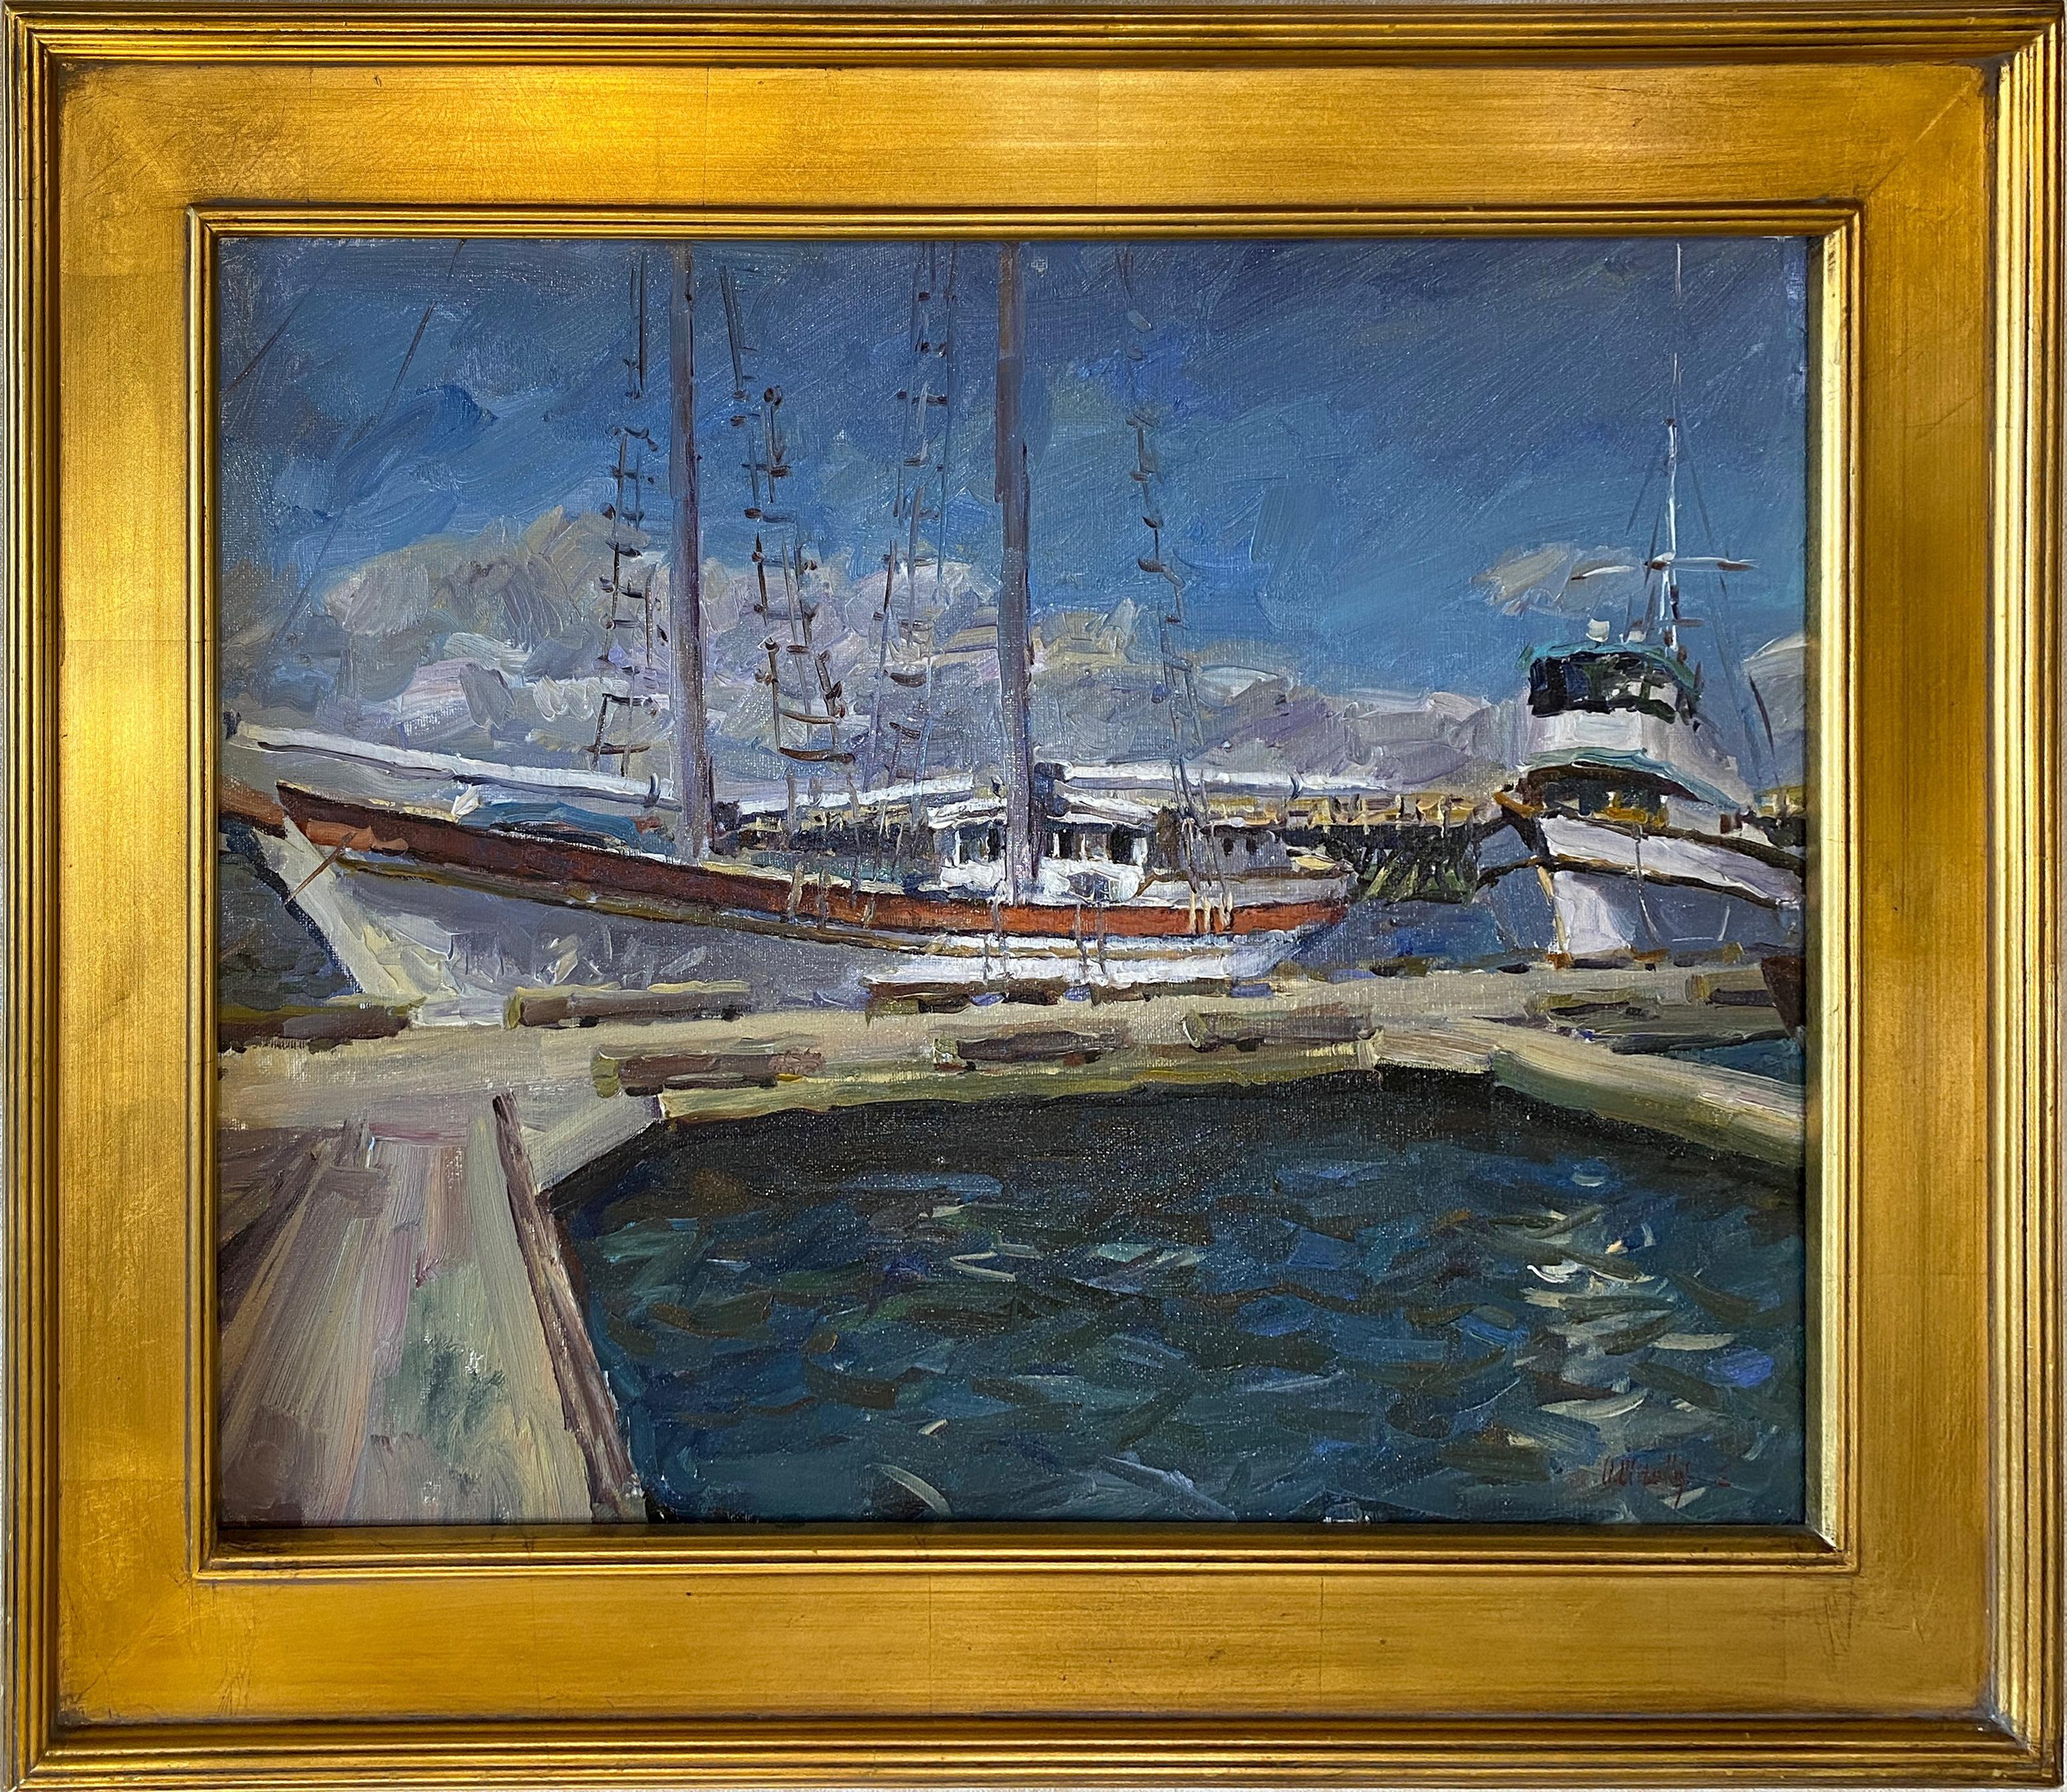 'Sunny Day' Oil on Canvas Painting by Ukranian artist Oleg Ulitskiy